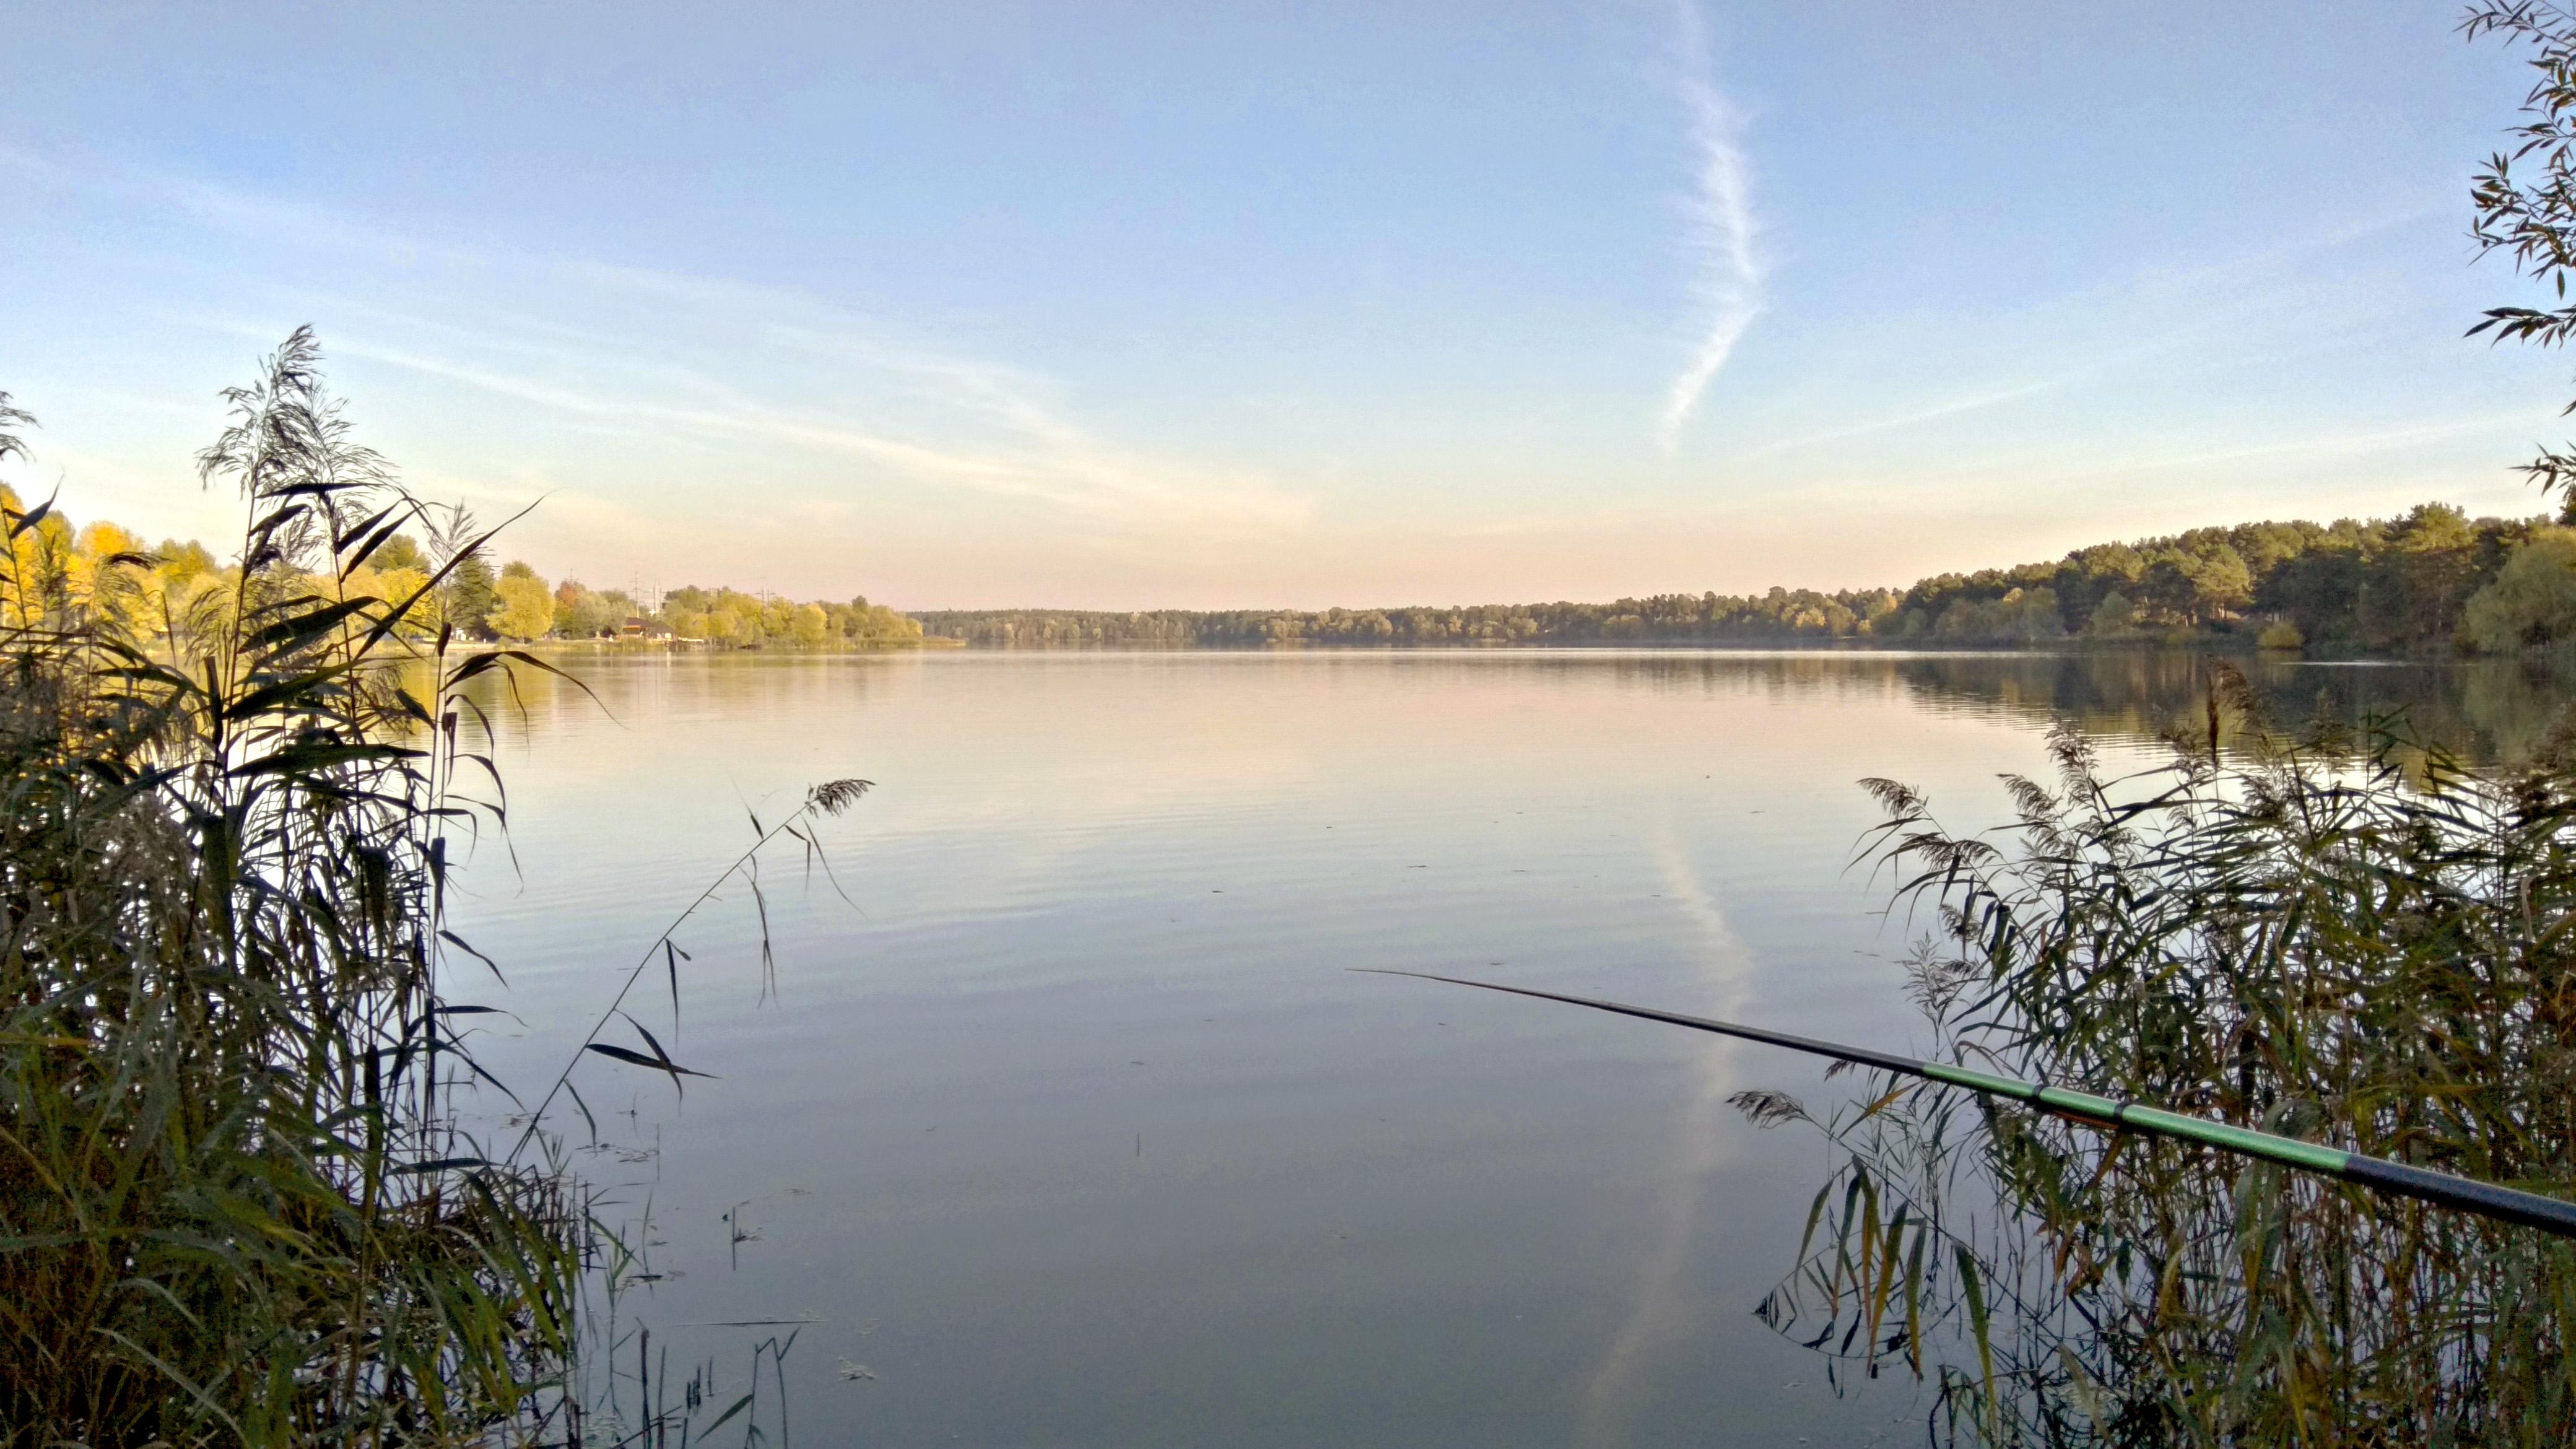 осень, природа, рыбалка, озеро, лес, 4k обои, lake